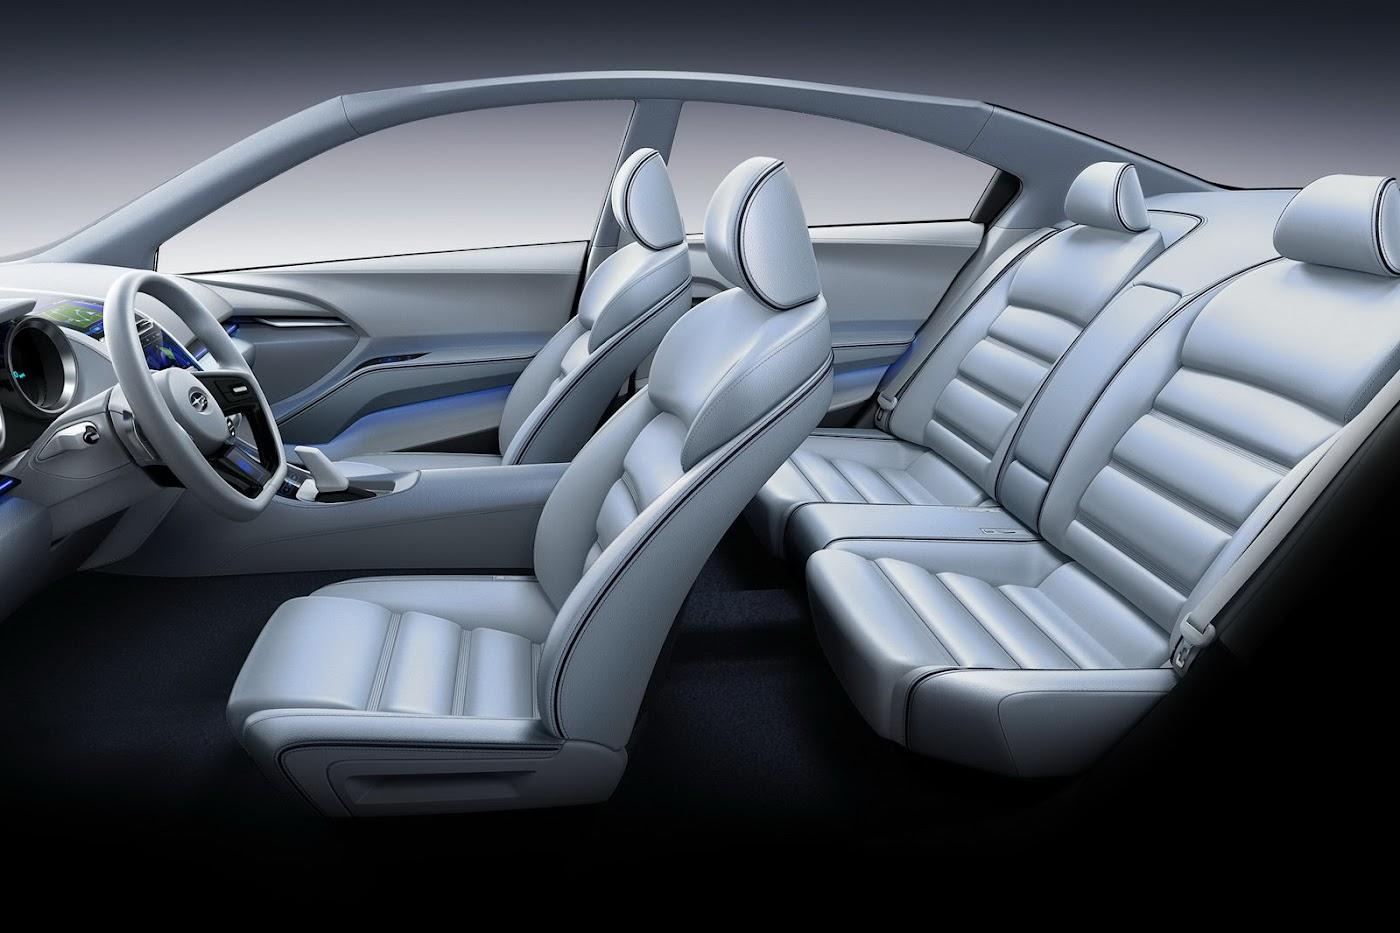 2012 Subaru Impreza Concept Interior